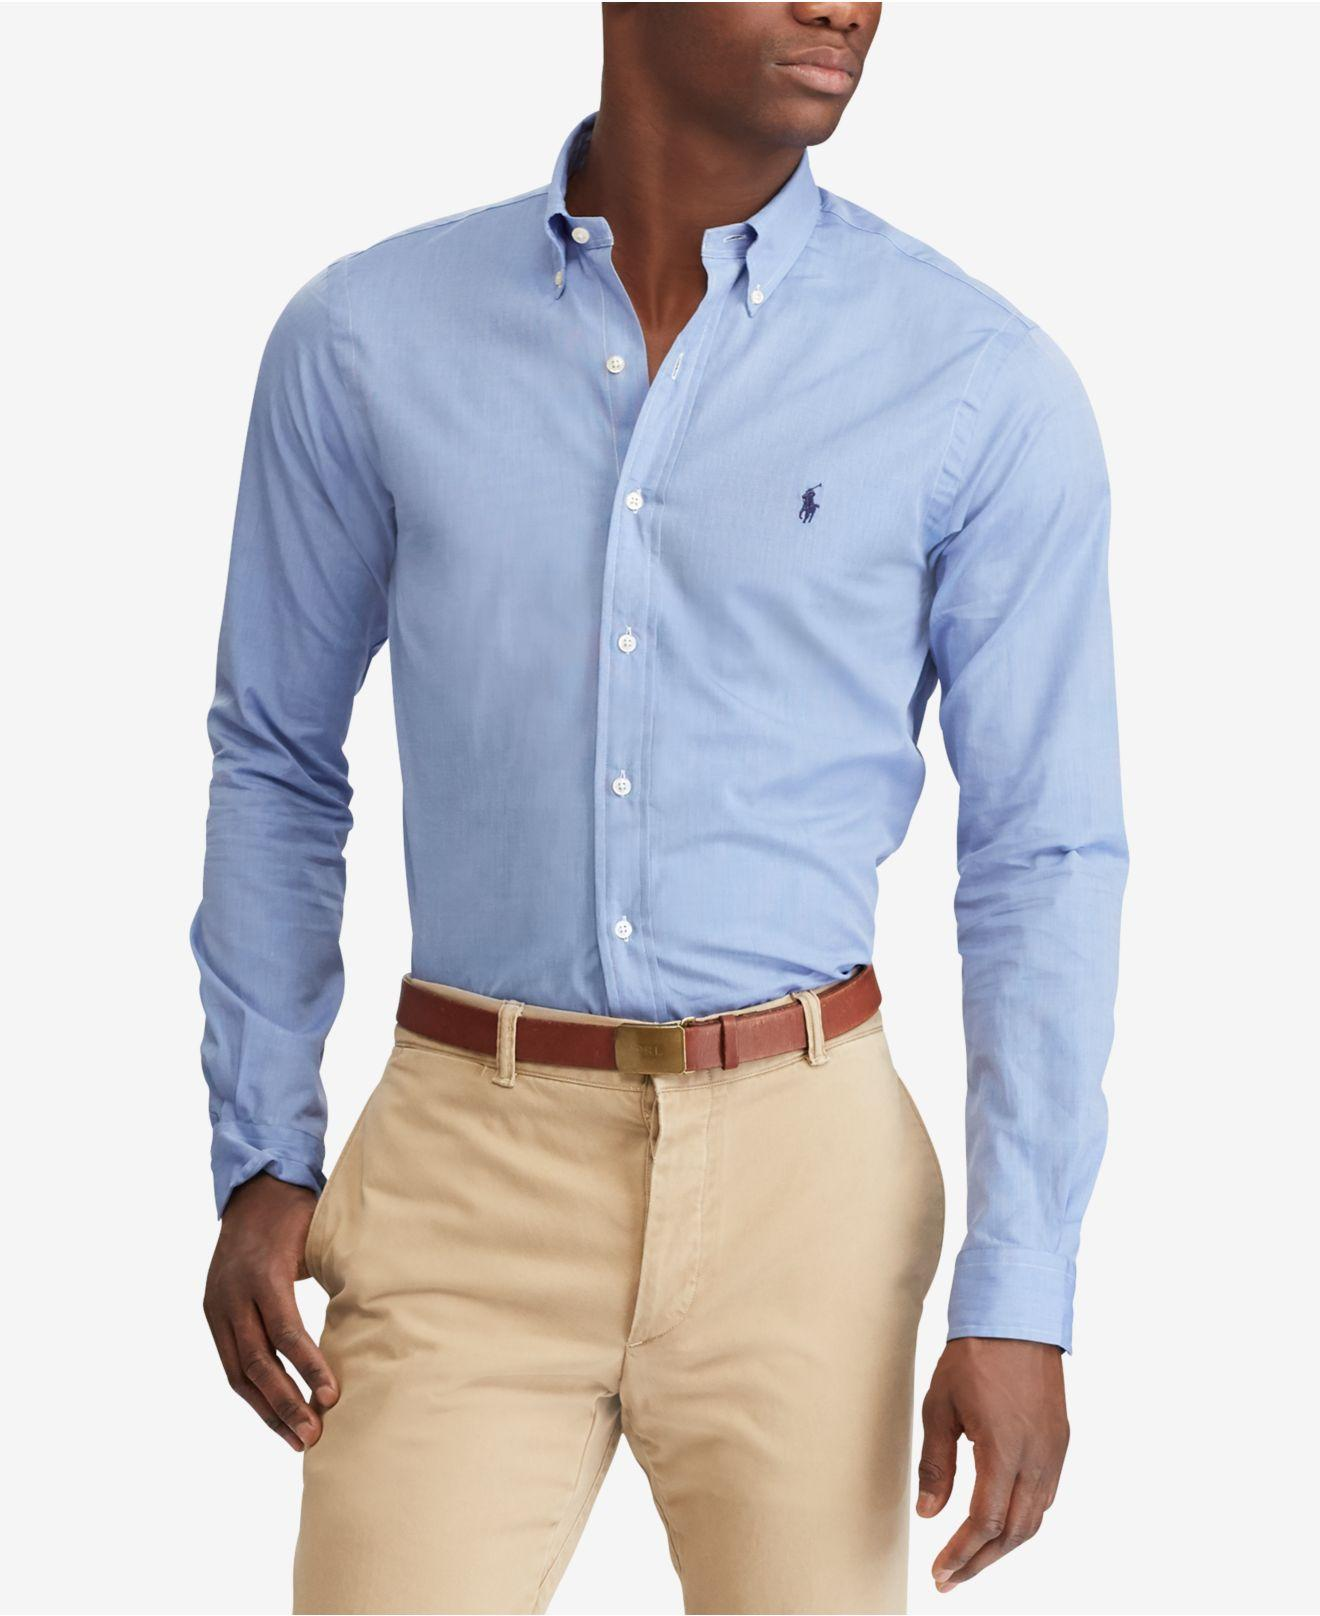 4ed00061d41 Lyst - Polo Ralph Lauren Slim Fit Poplin Stretch Shirt in Blue for Men